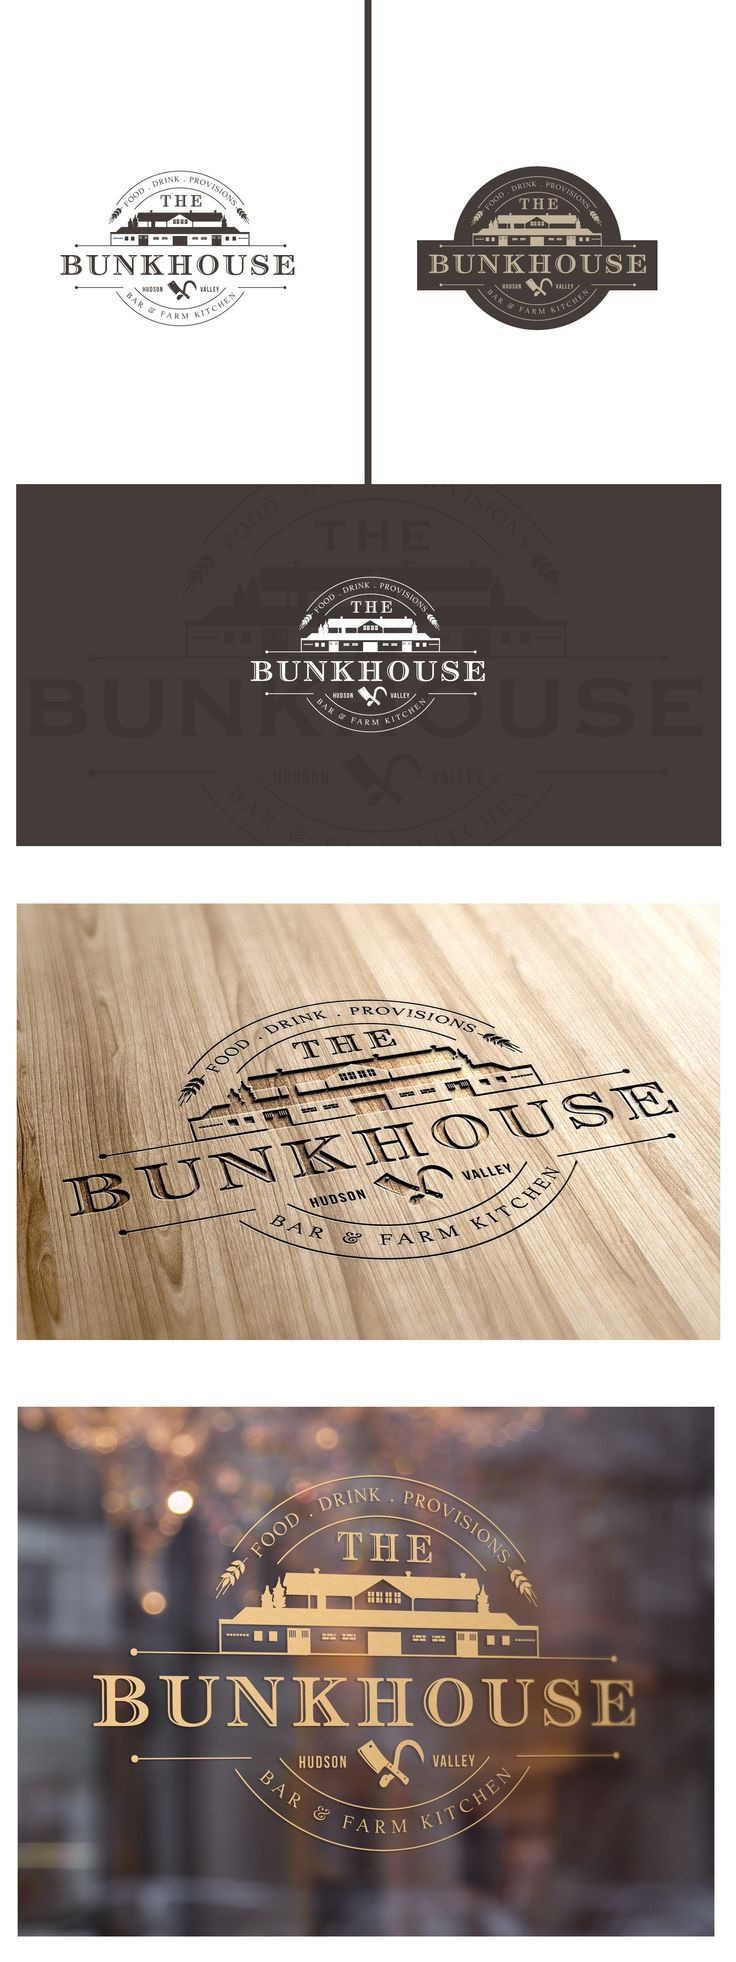 Logo design for historical bootleg distillery's farm-to-table restaurant